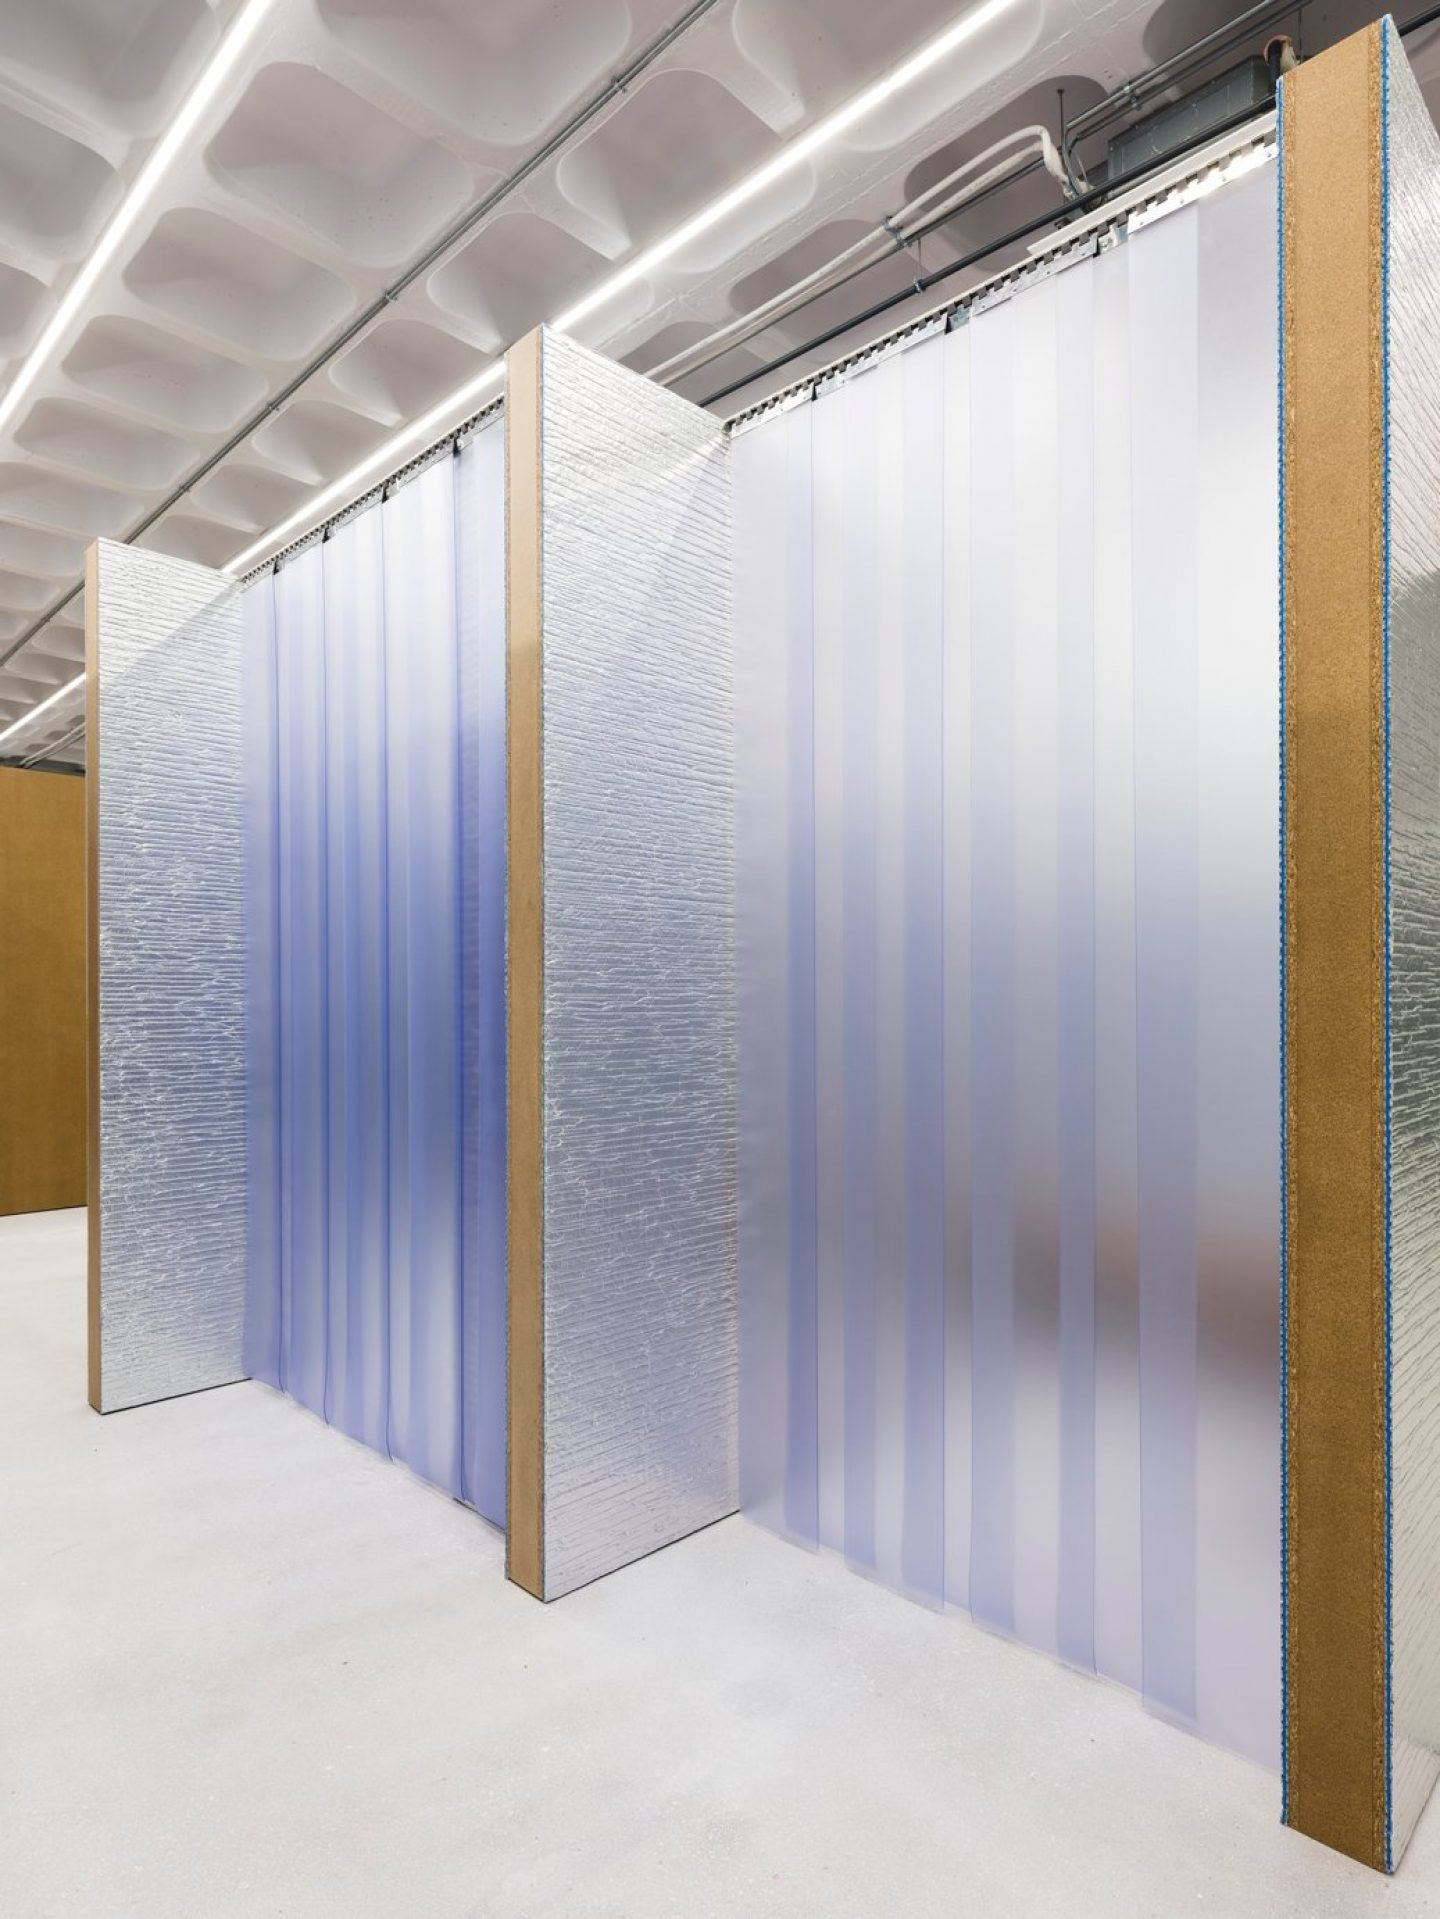 IGNANT-Architecture-Gonzalez-Haas-Tem-Plate-018